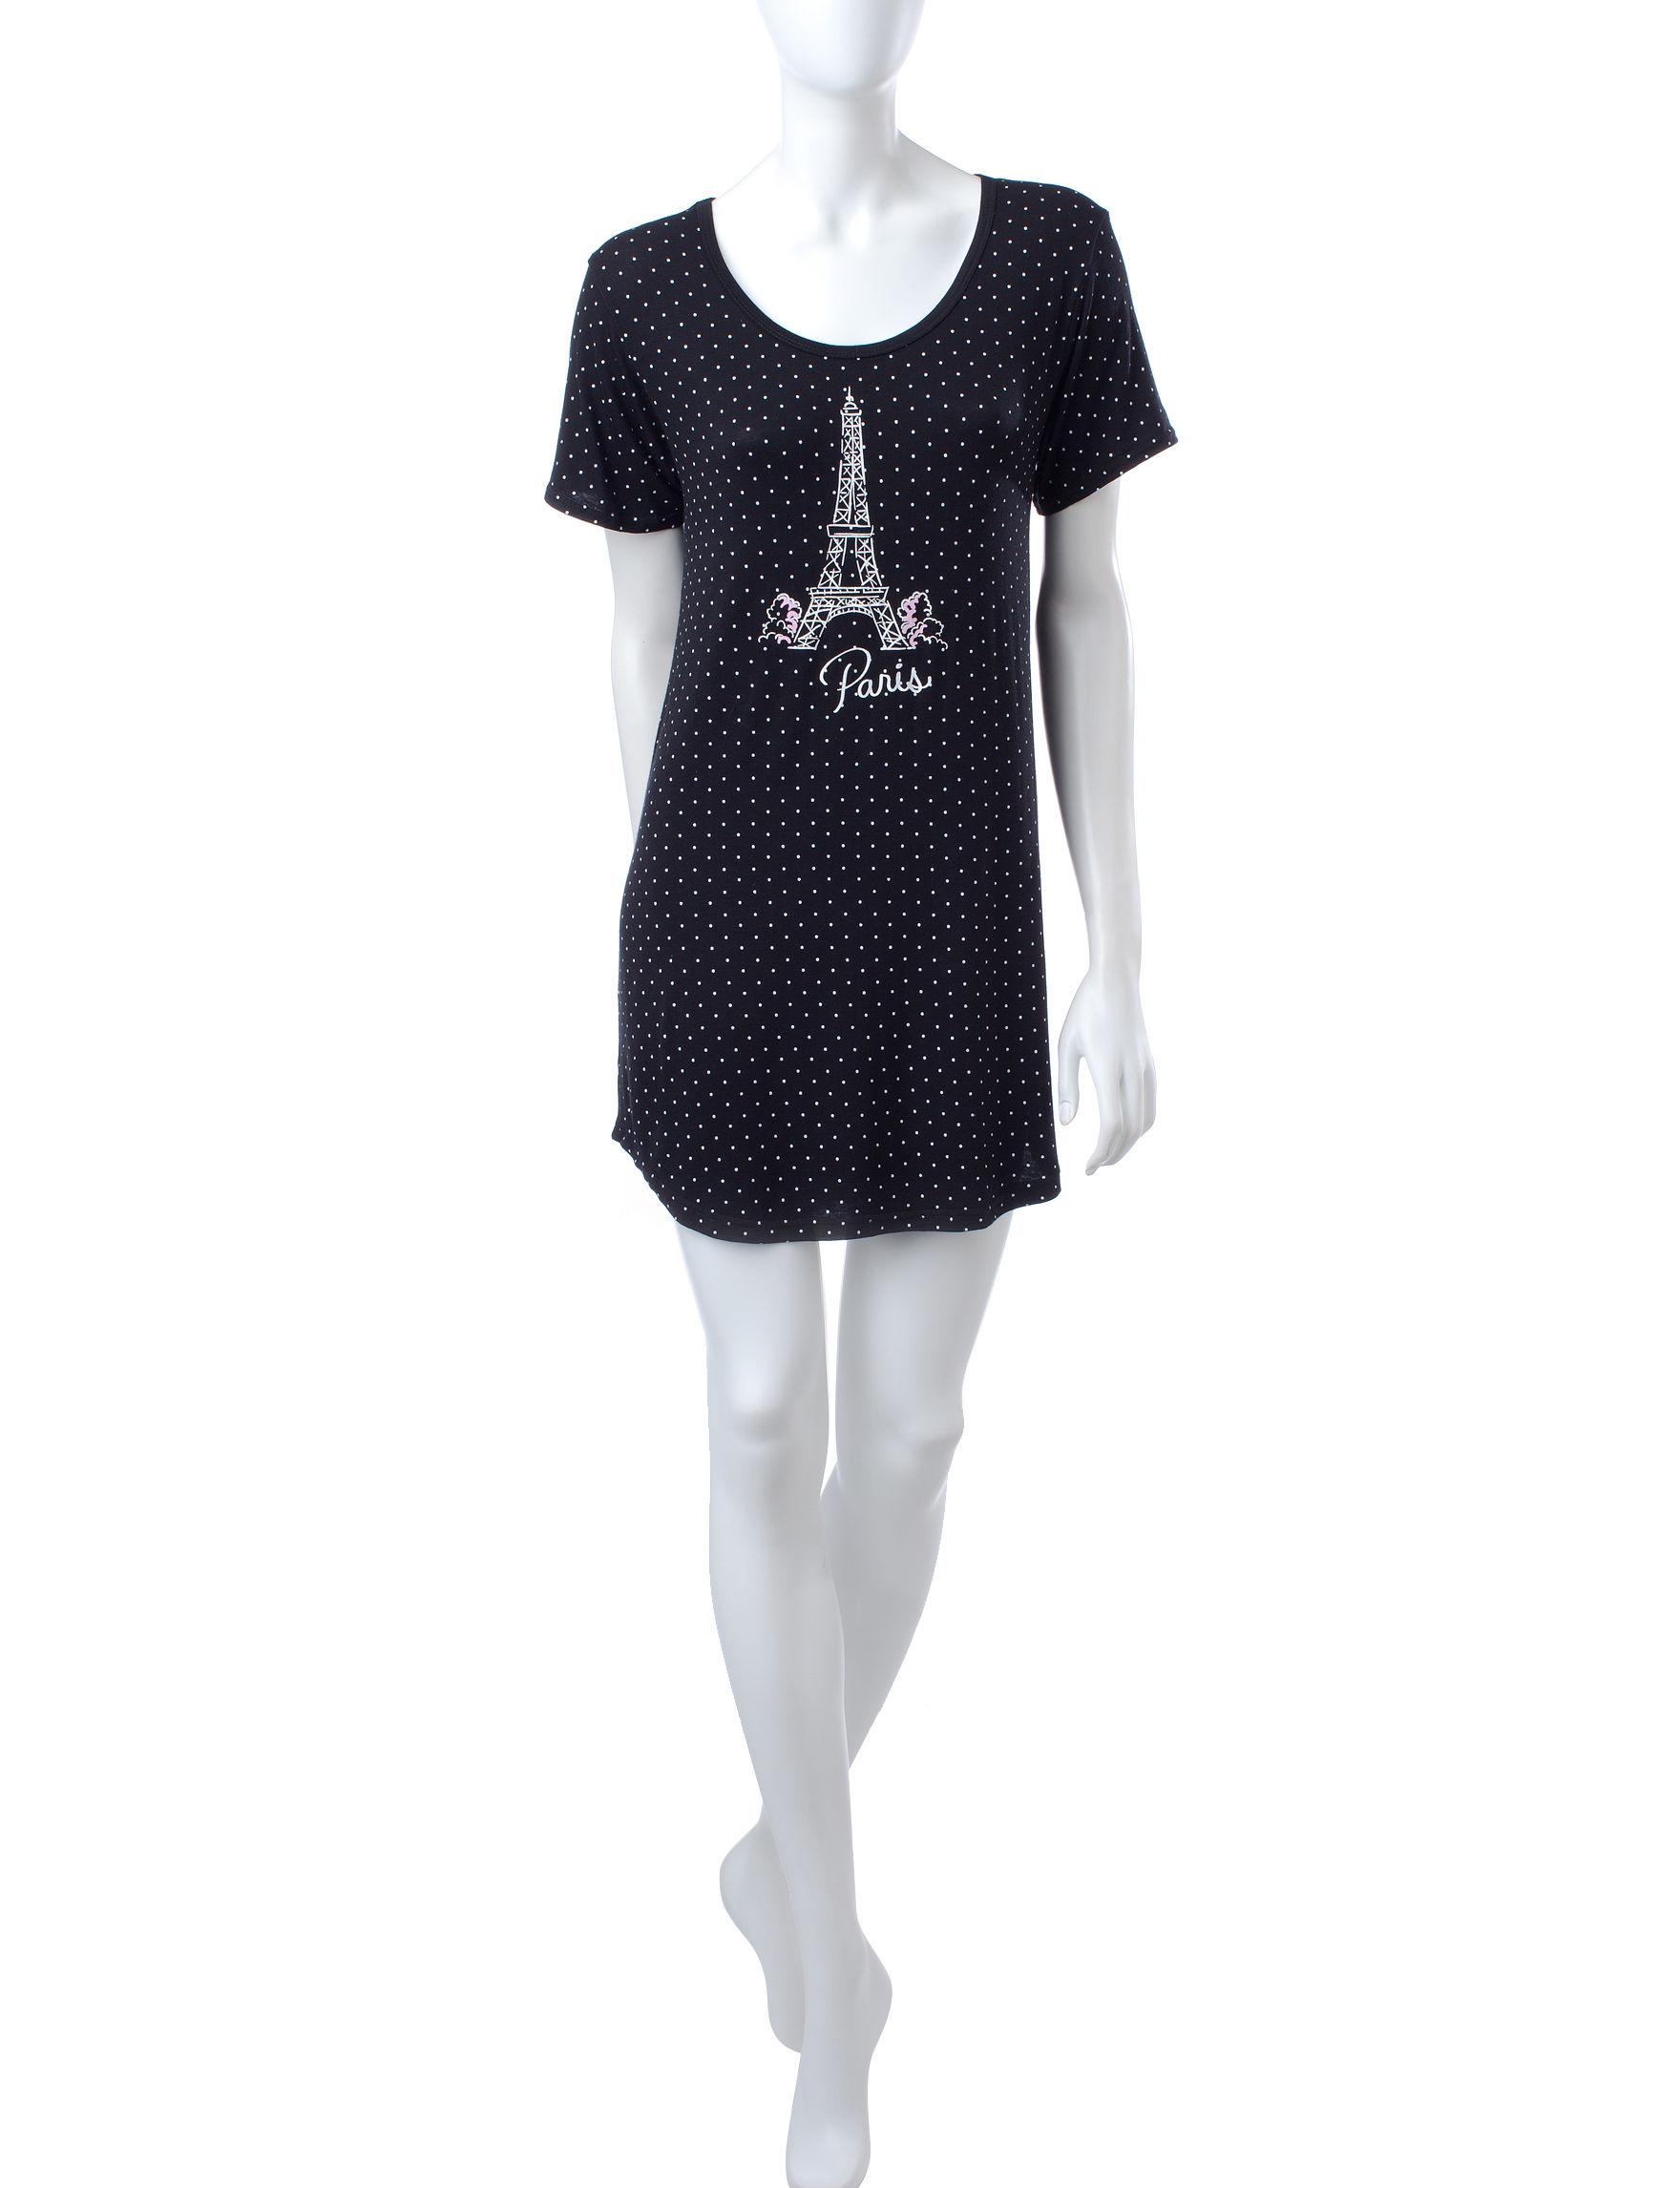 Laura Ashley Black Nightgowns & Sleep Shirts